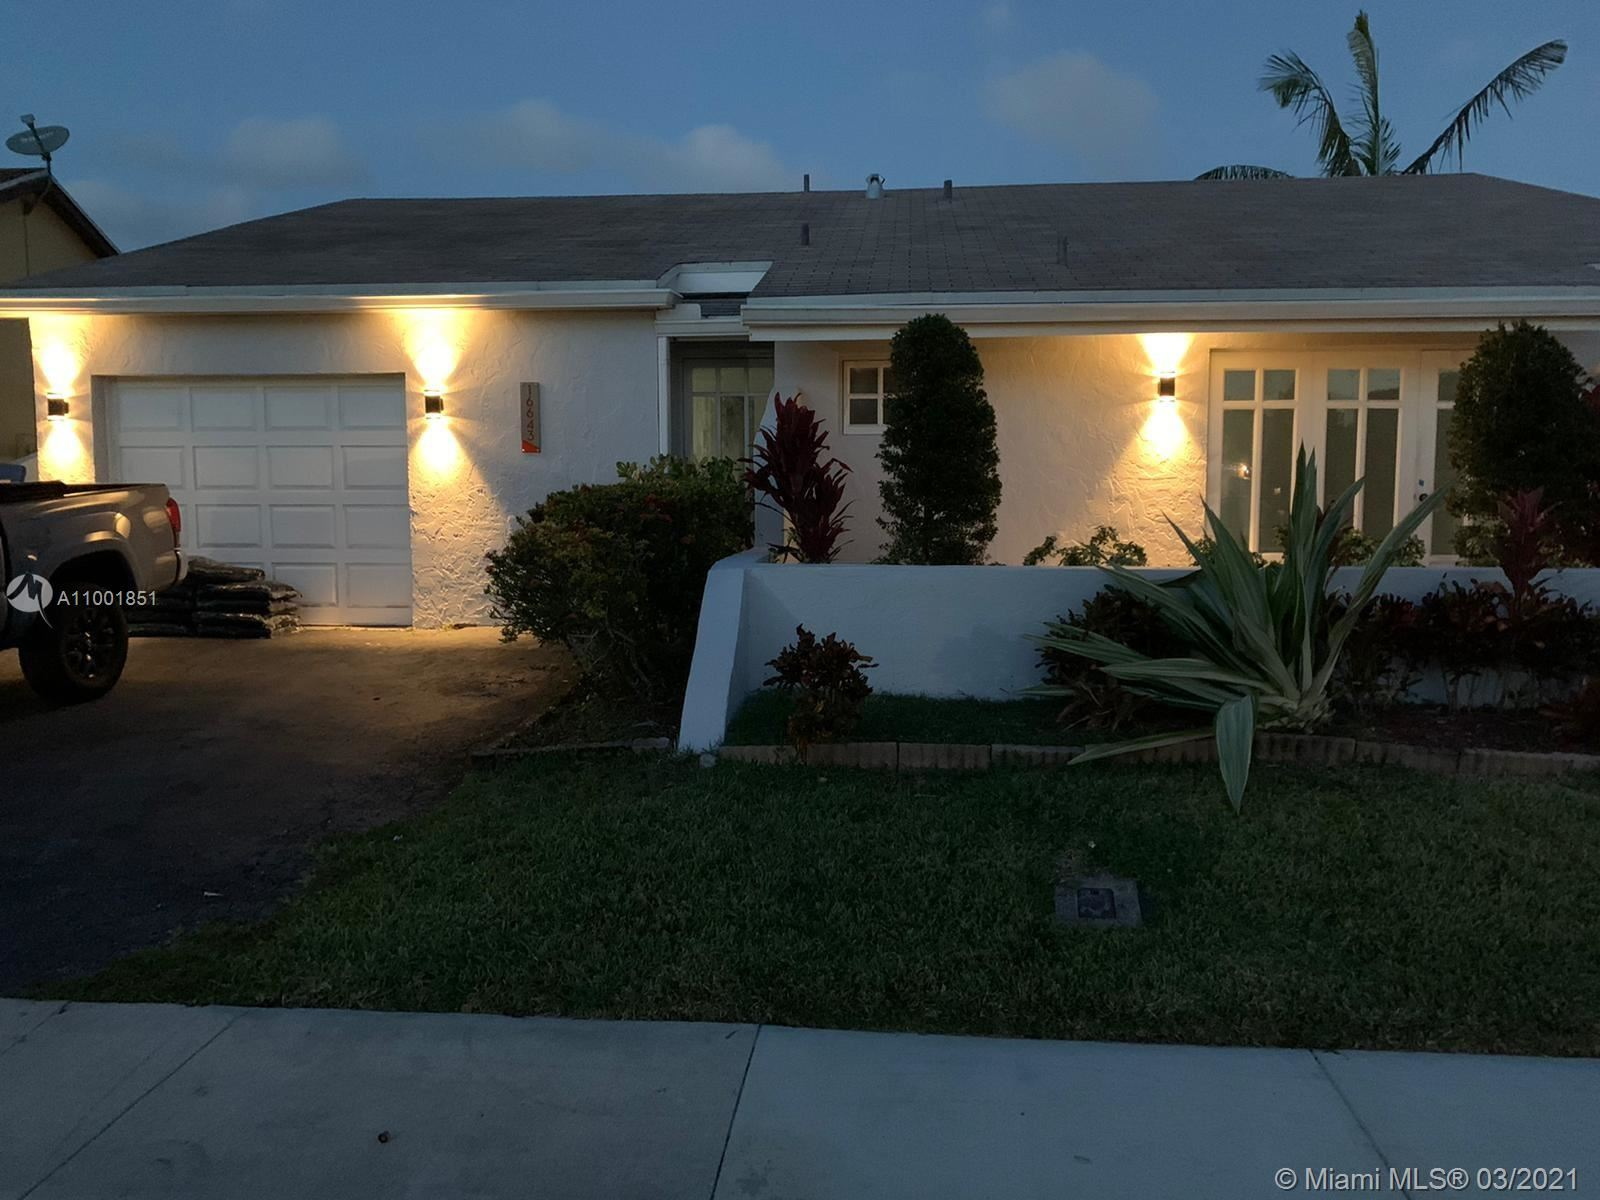 Photo of 16643 Redwood Way, Weston, FL 33326 (MLS # A11001851)